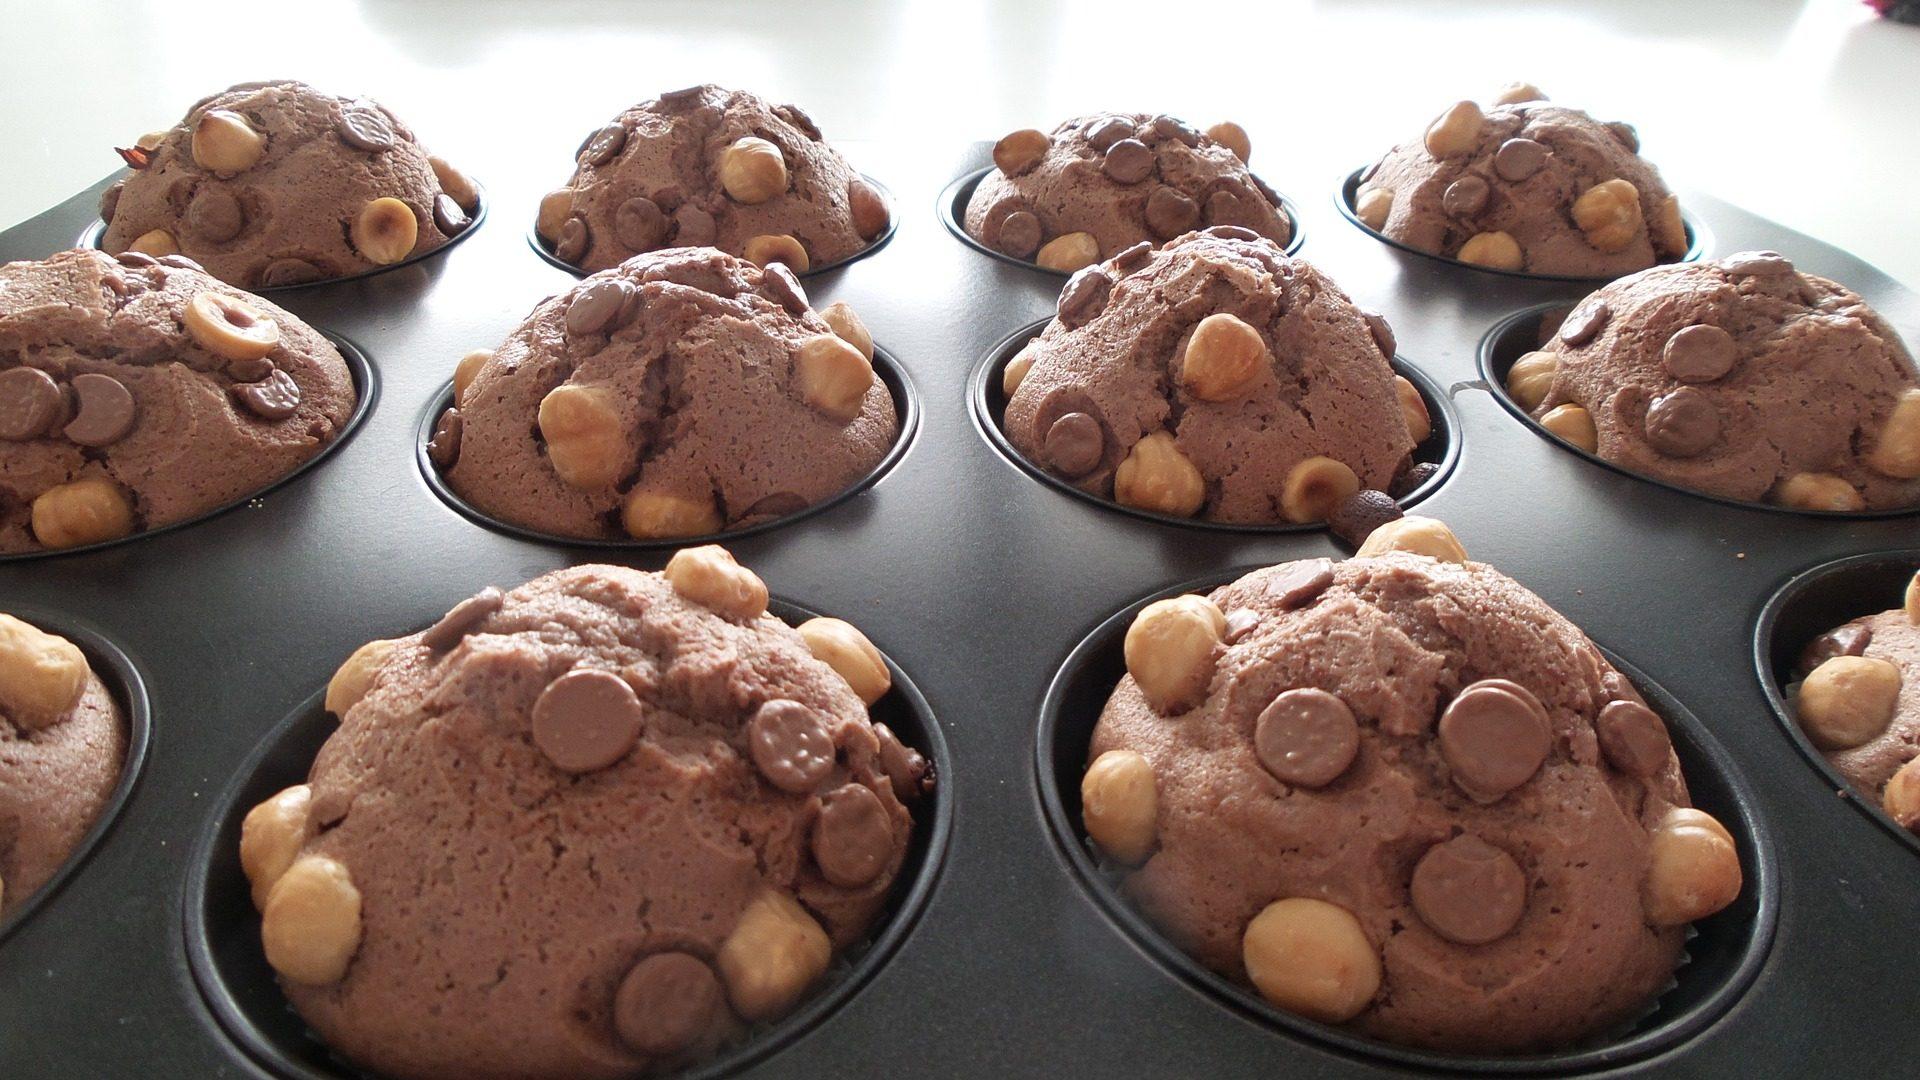 hazelnut-muffin-693288_1920